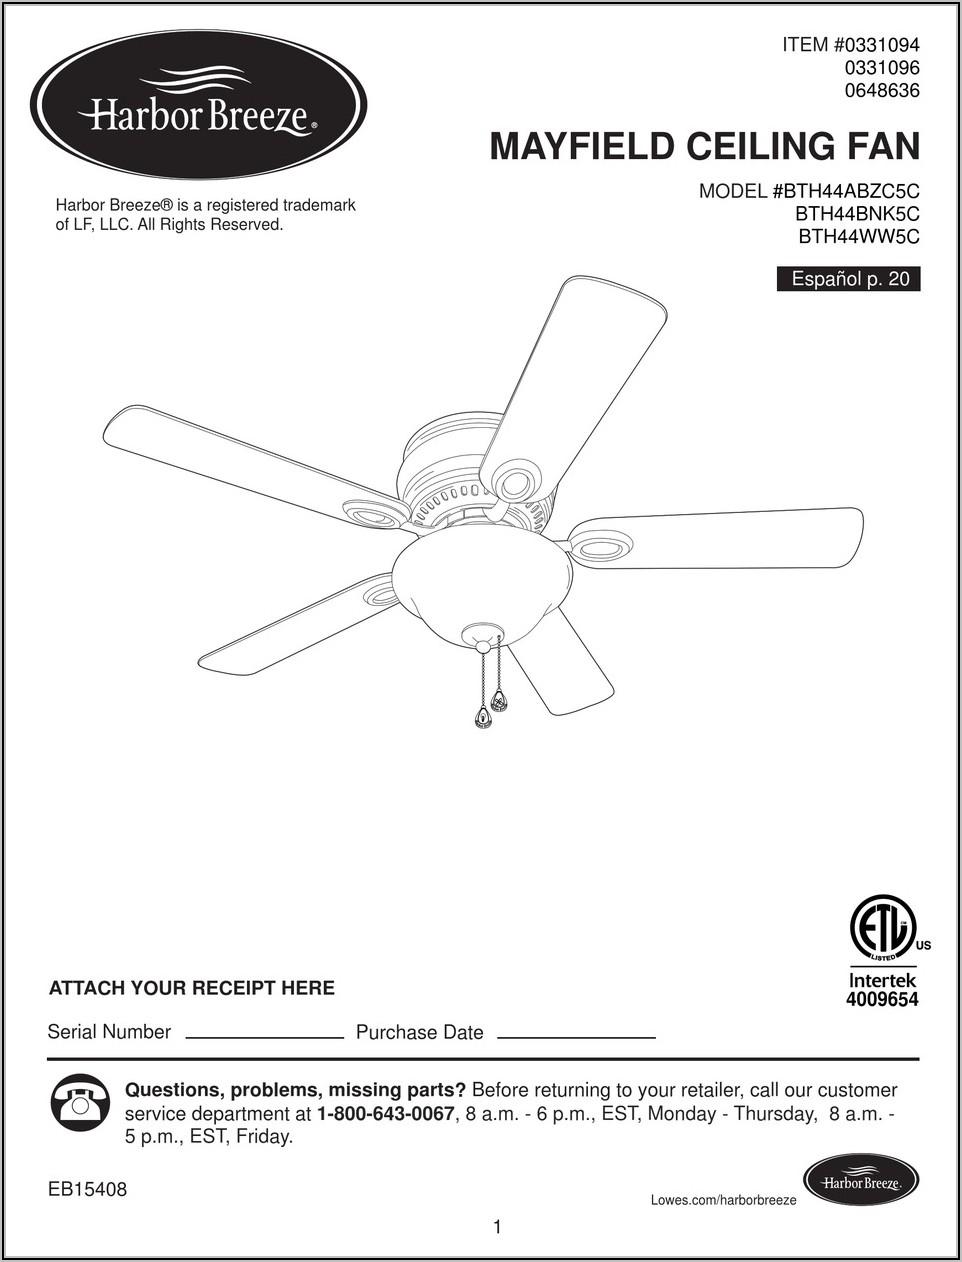 Harbor Breeze Mayfield Ceiling Fan Installation Instructions